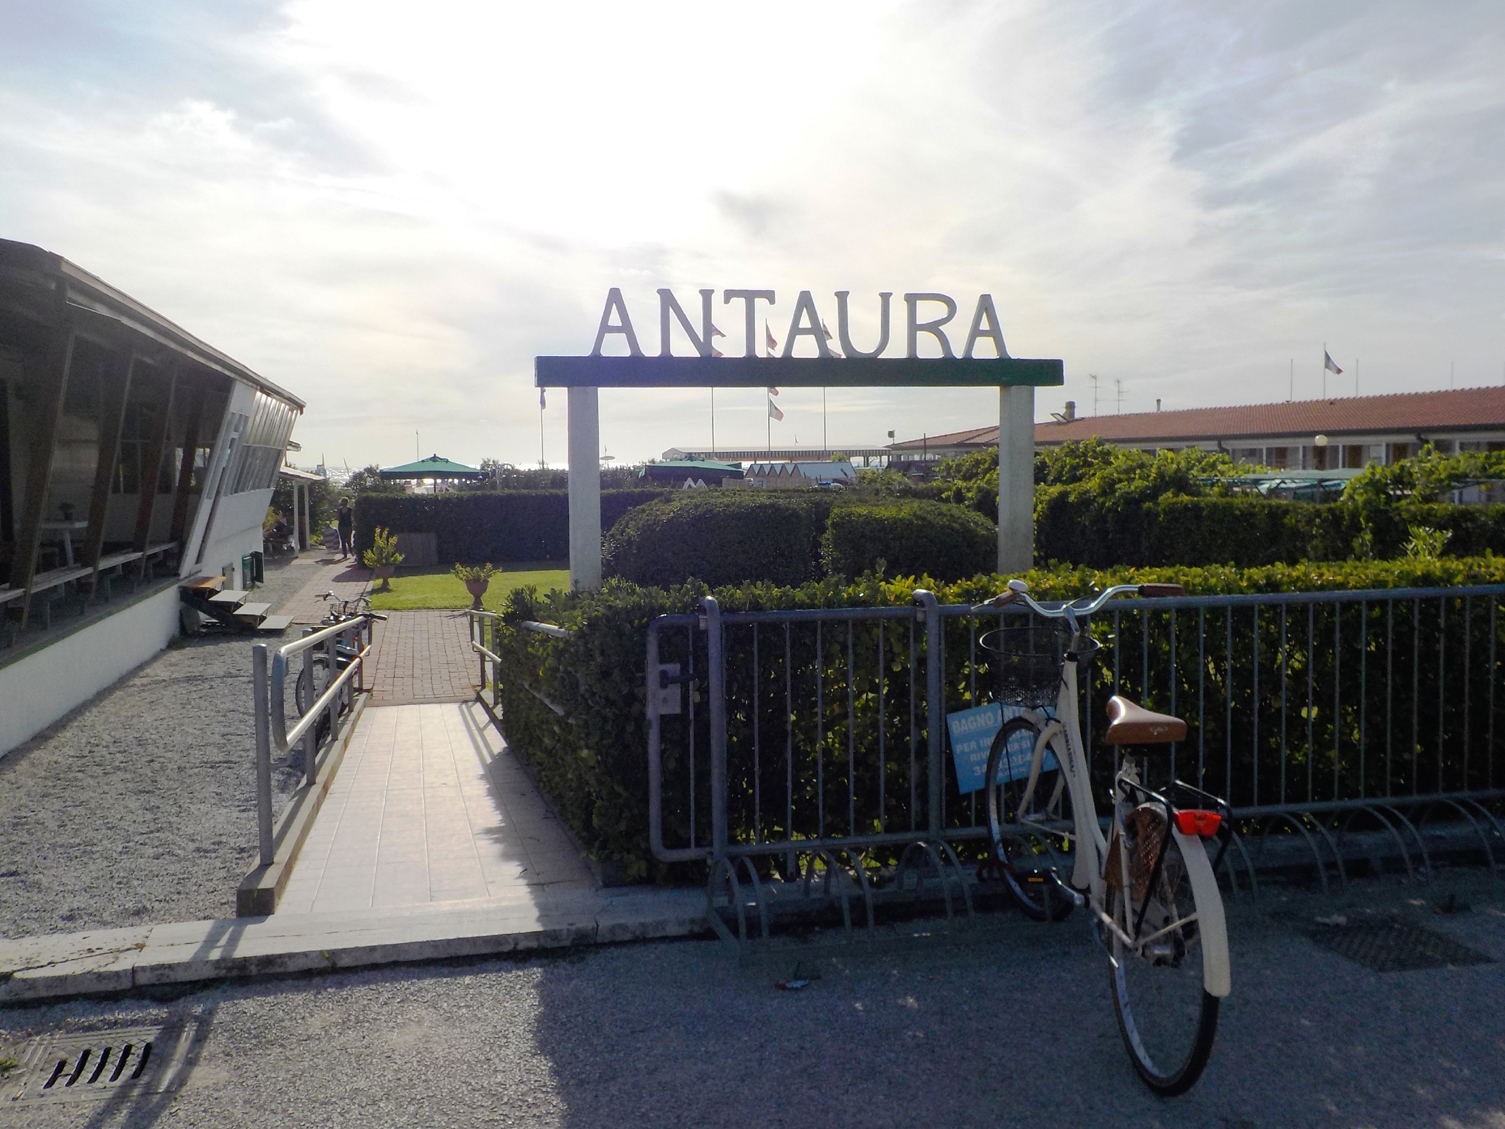 Bagno antaura handy superabile - Bagno genova viareggio ...